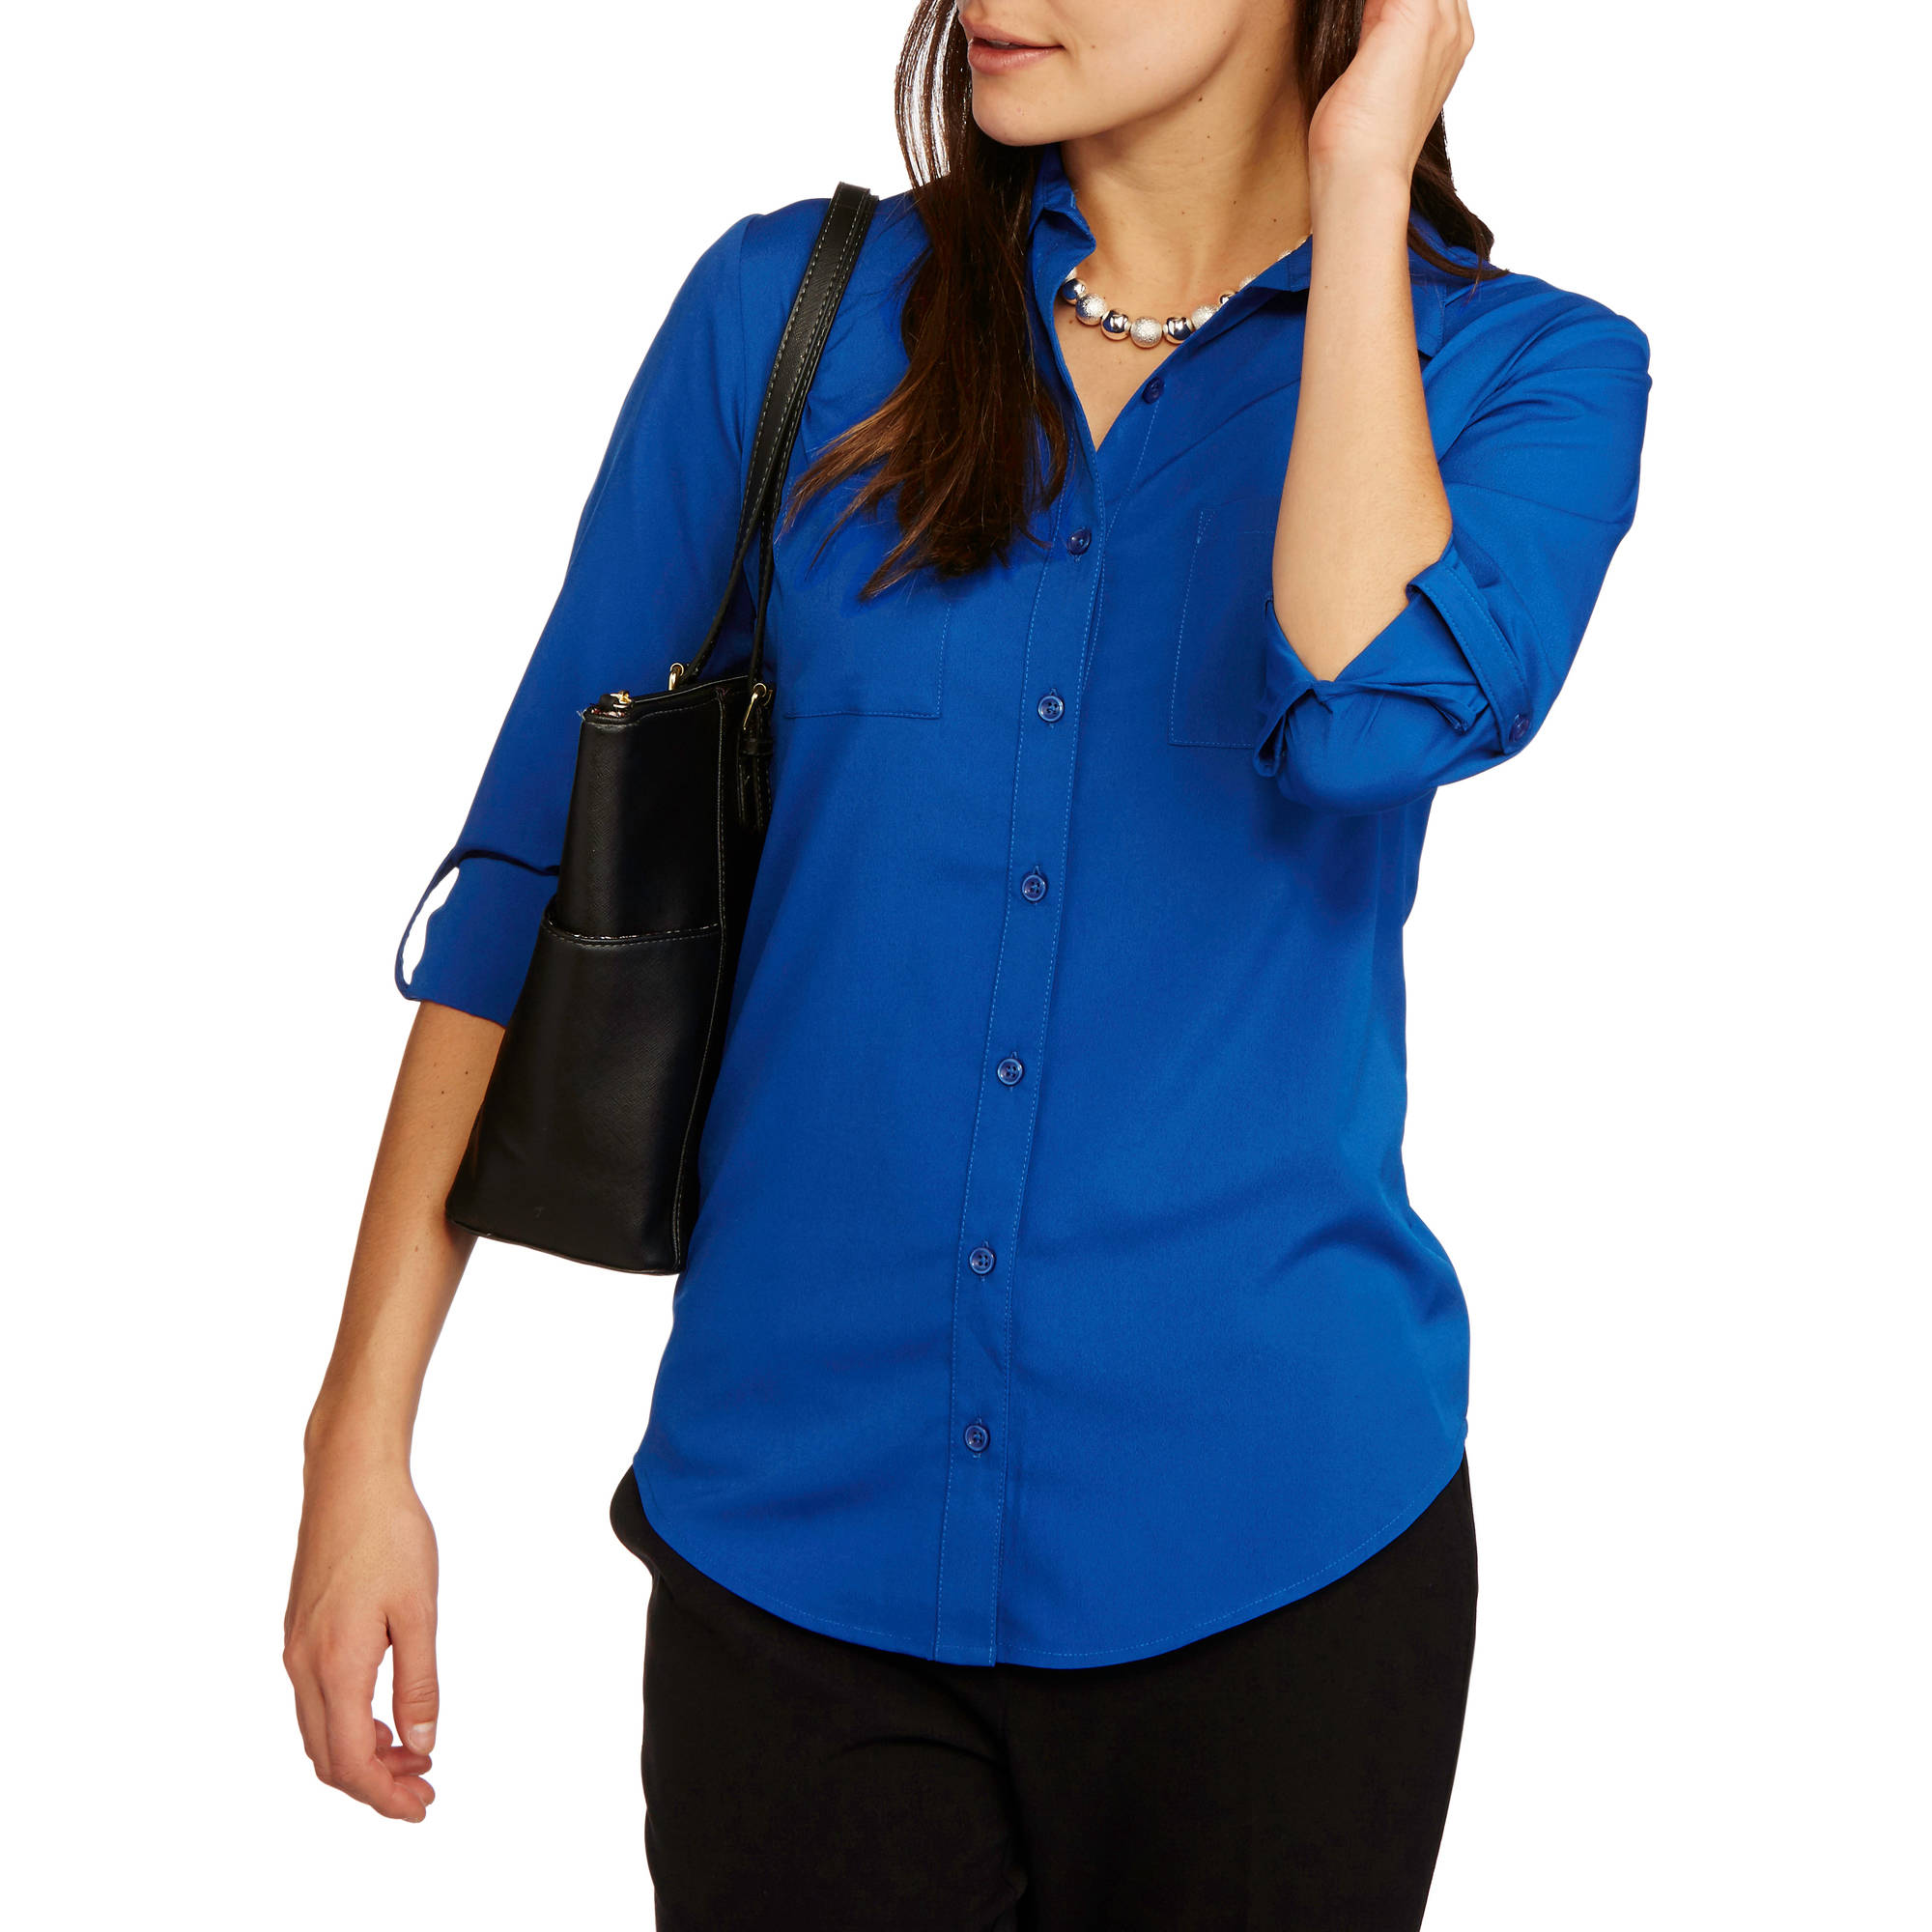 b87f3cfa87d Faded Glory - Women's Soft Woven Button Up Shirt - Walmart.com